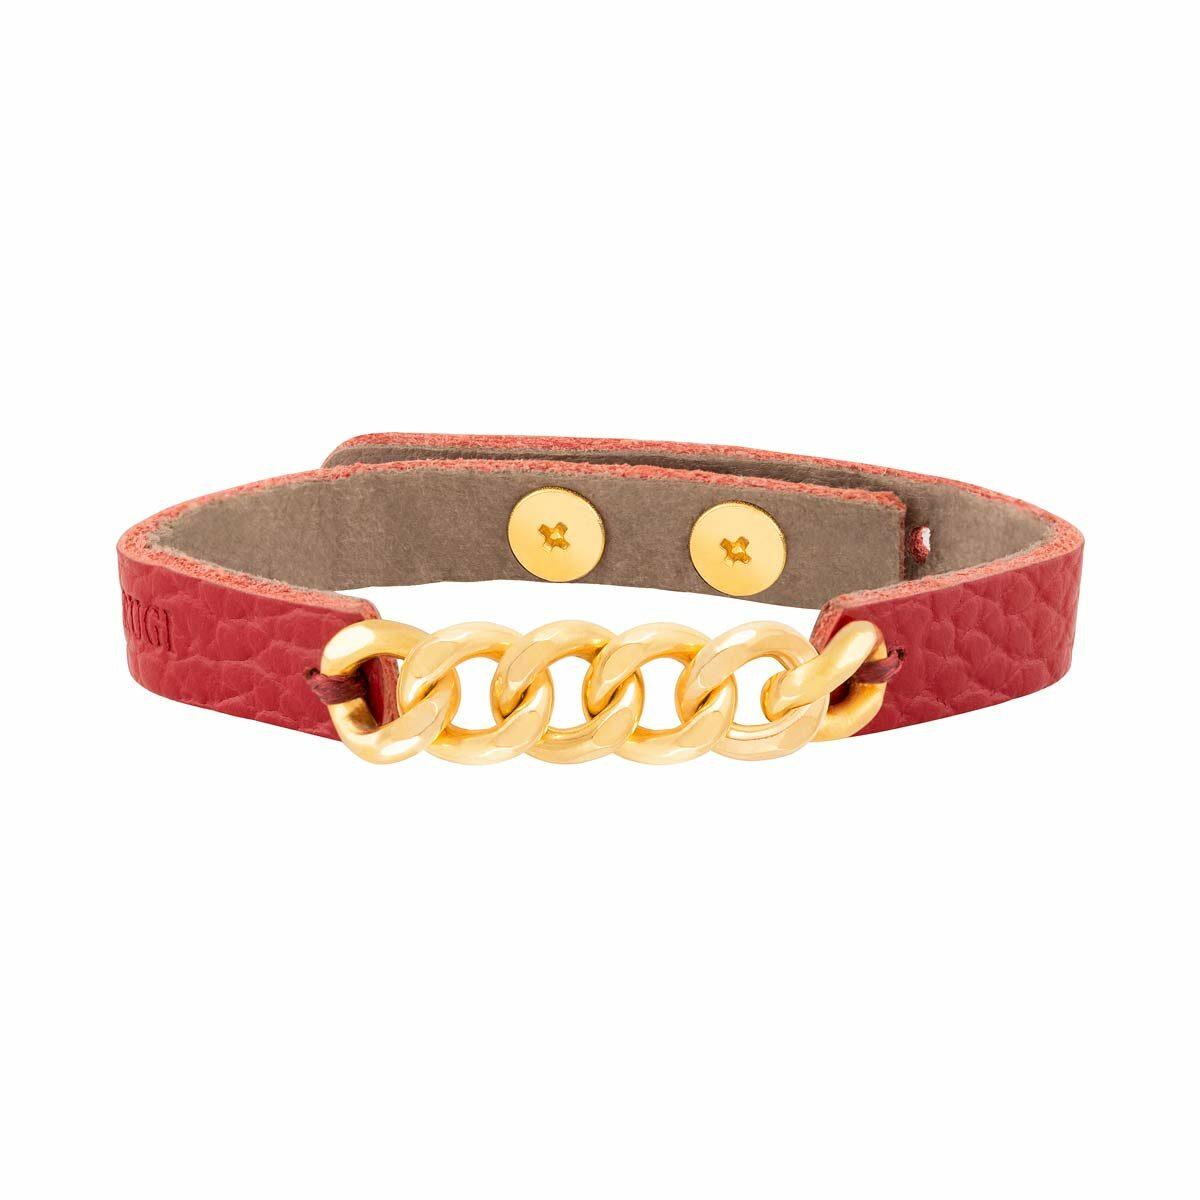 دستبند طلا چرمی شش حلقه کارتیه